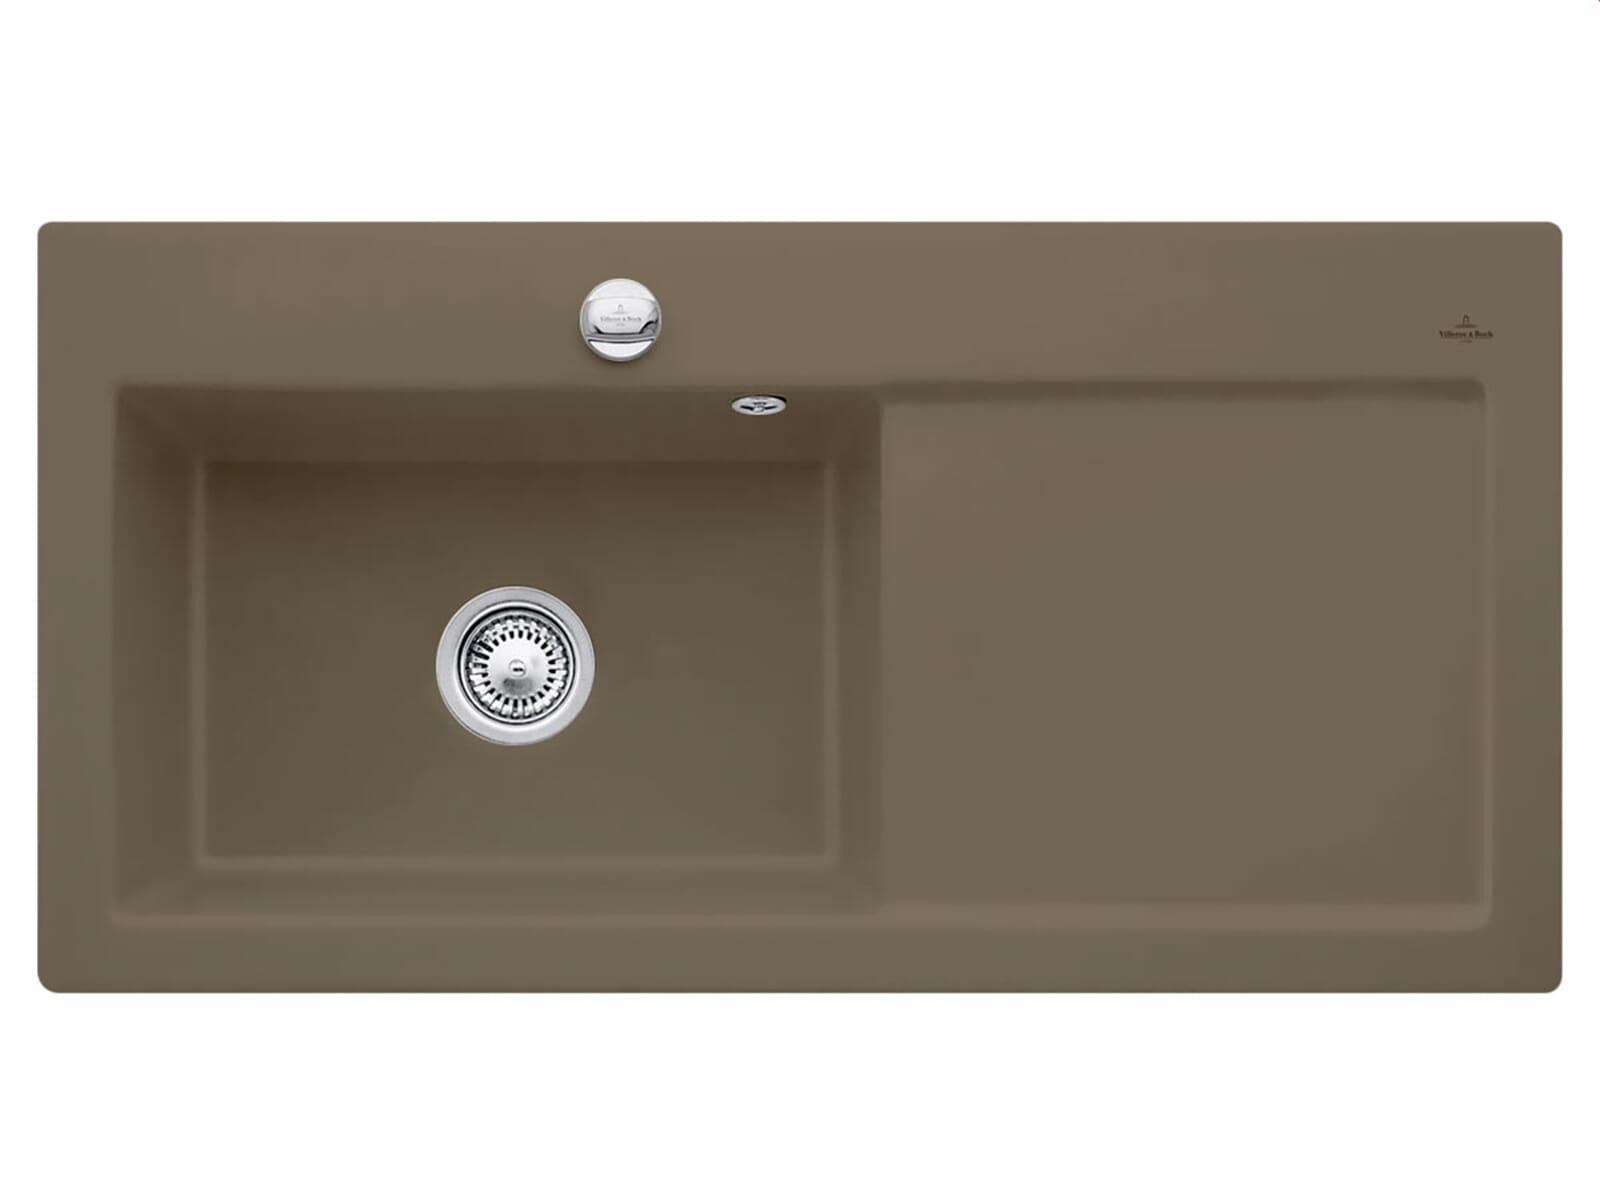 Villeroy & Boch Subway 60 XL Timber - 6718 02 TR Keramikspüle Exzenterbetätigung